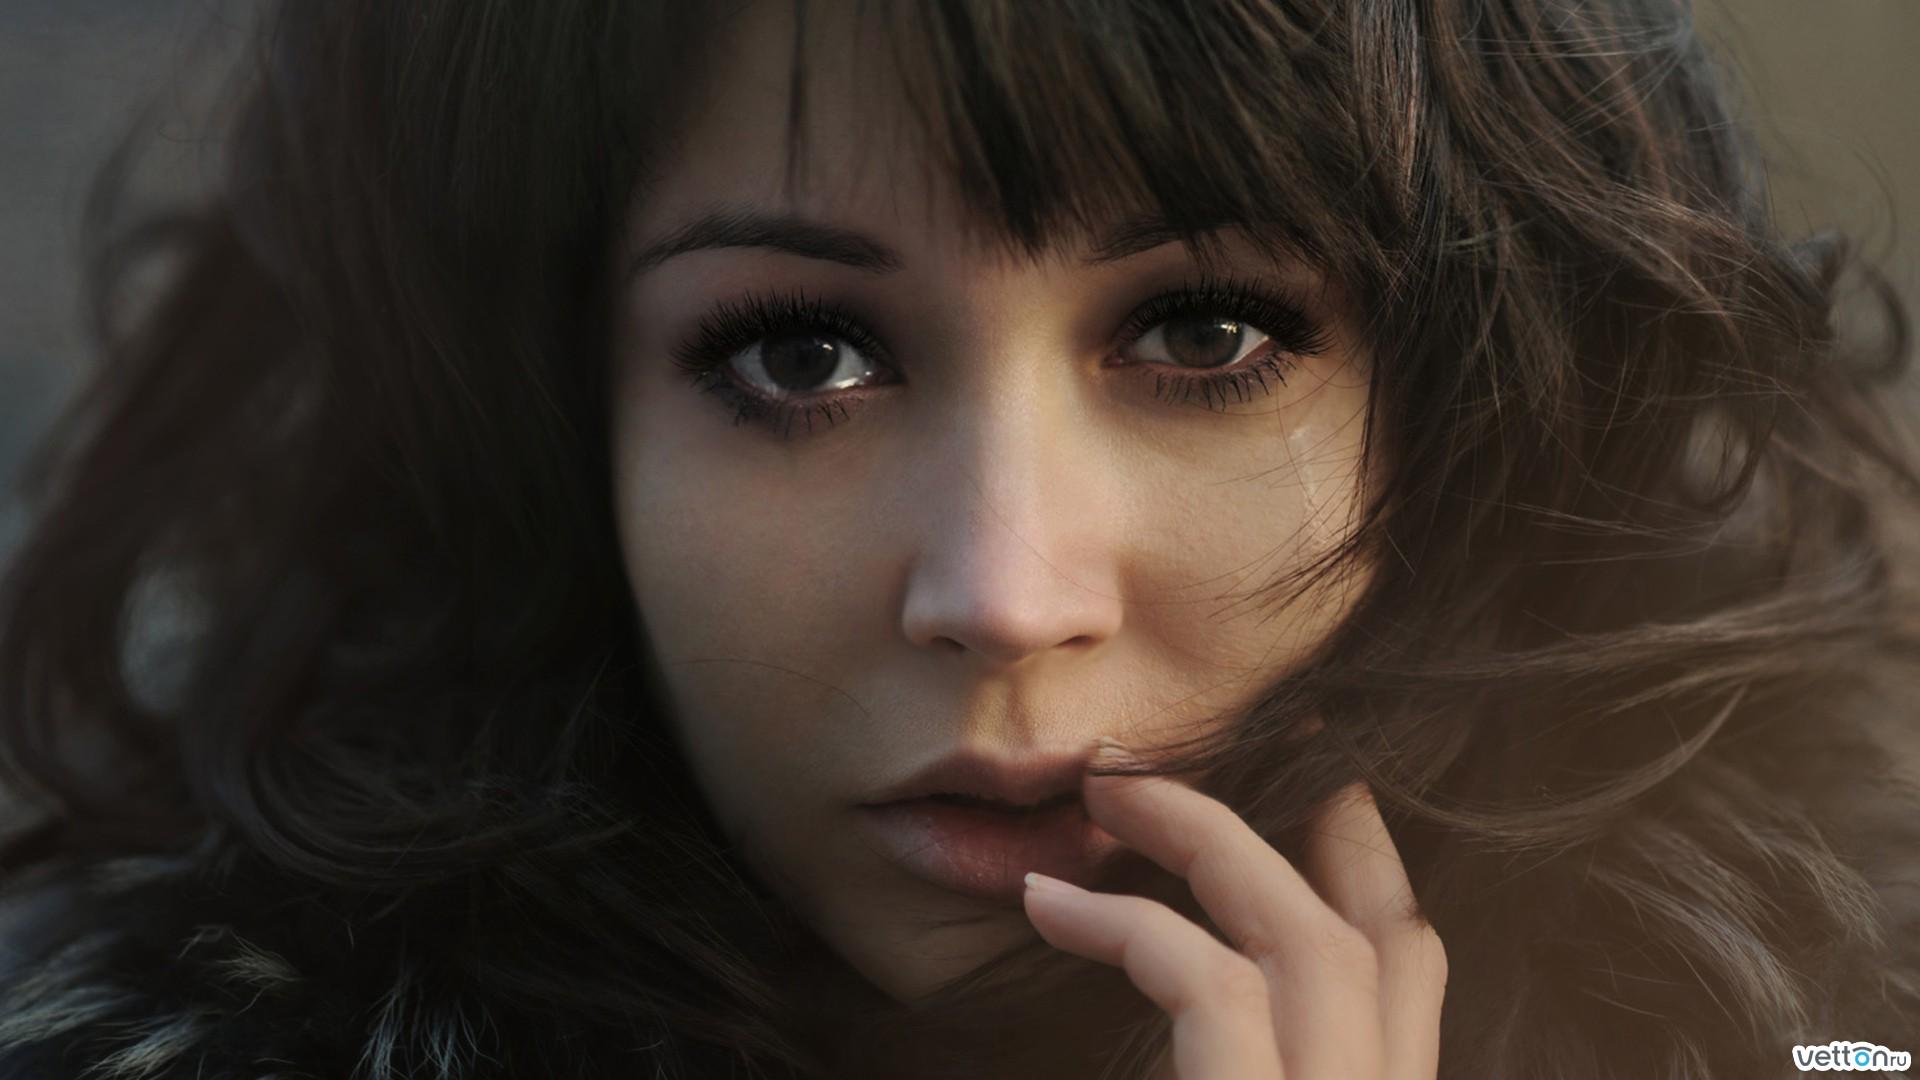 http://img2.vetton.ru/upl/13000/12996/vetton_ru_fotos19-1920x1080.jpg